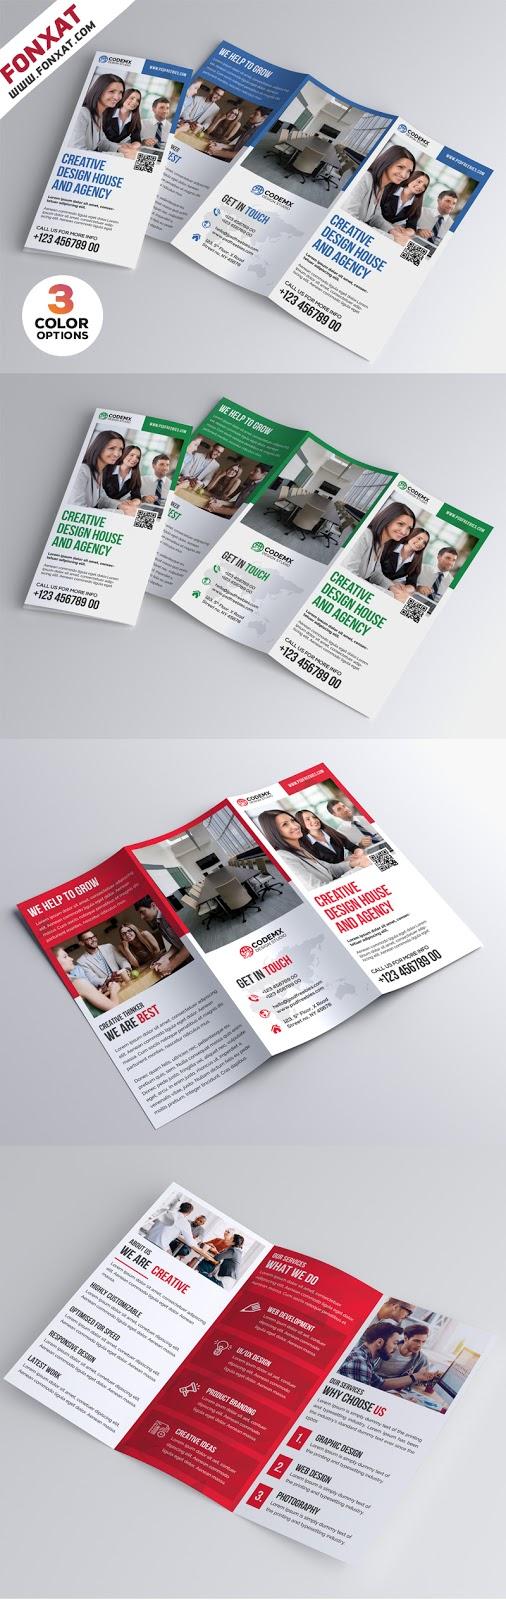 Professional-A4-Tri-fold-Brochure-PSD-Bundle